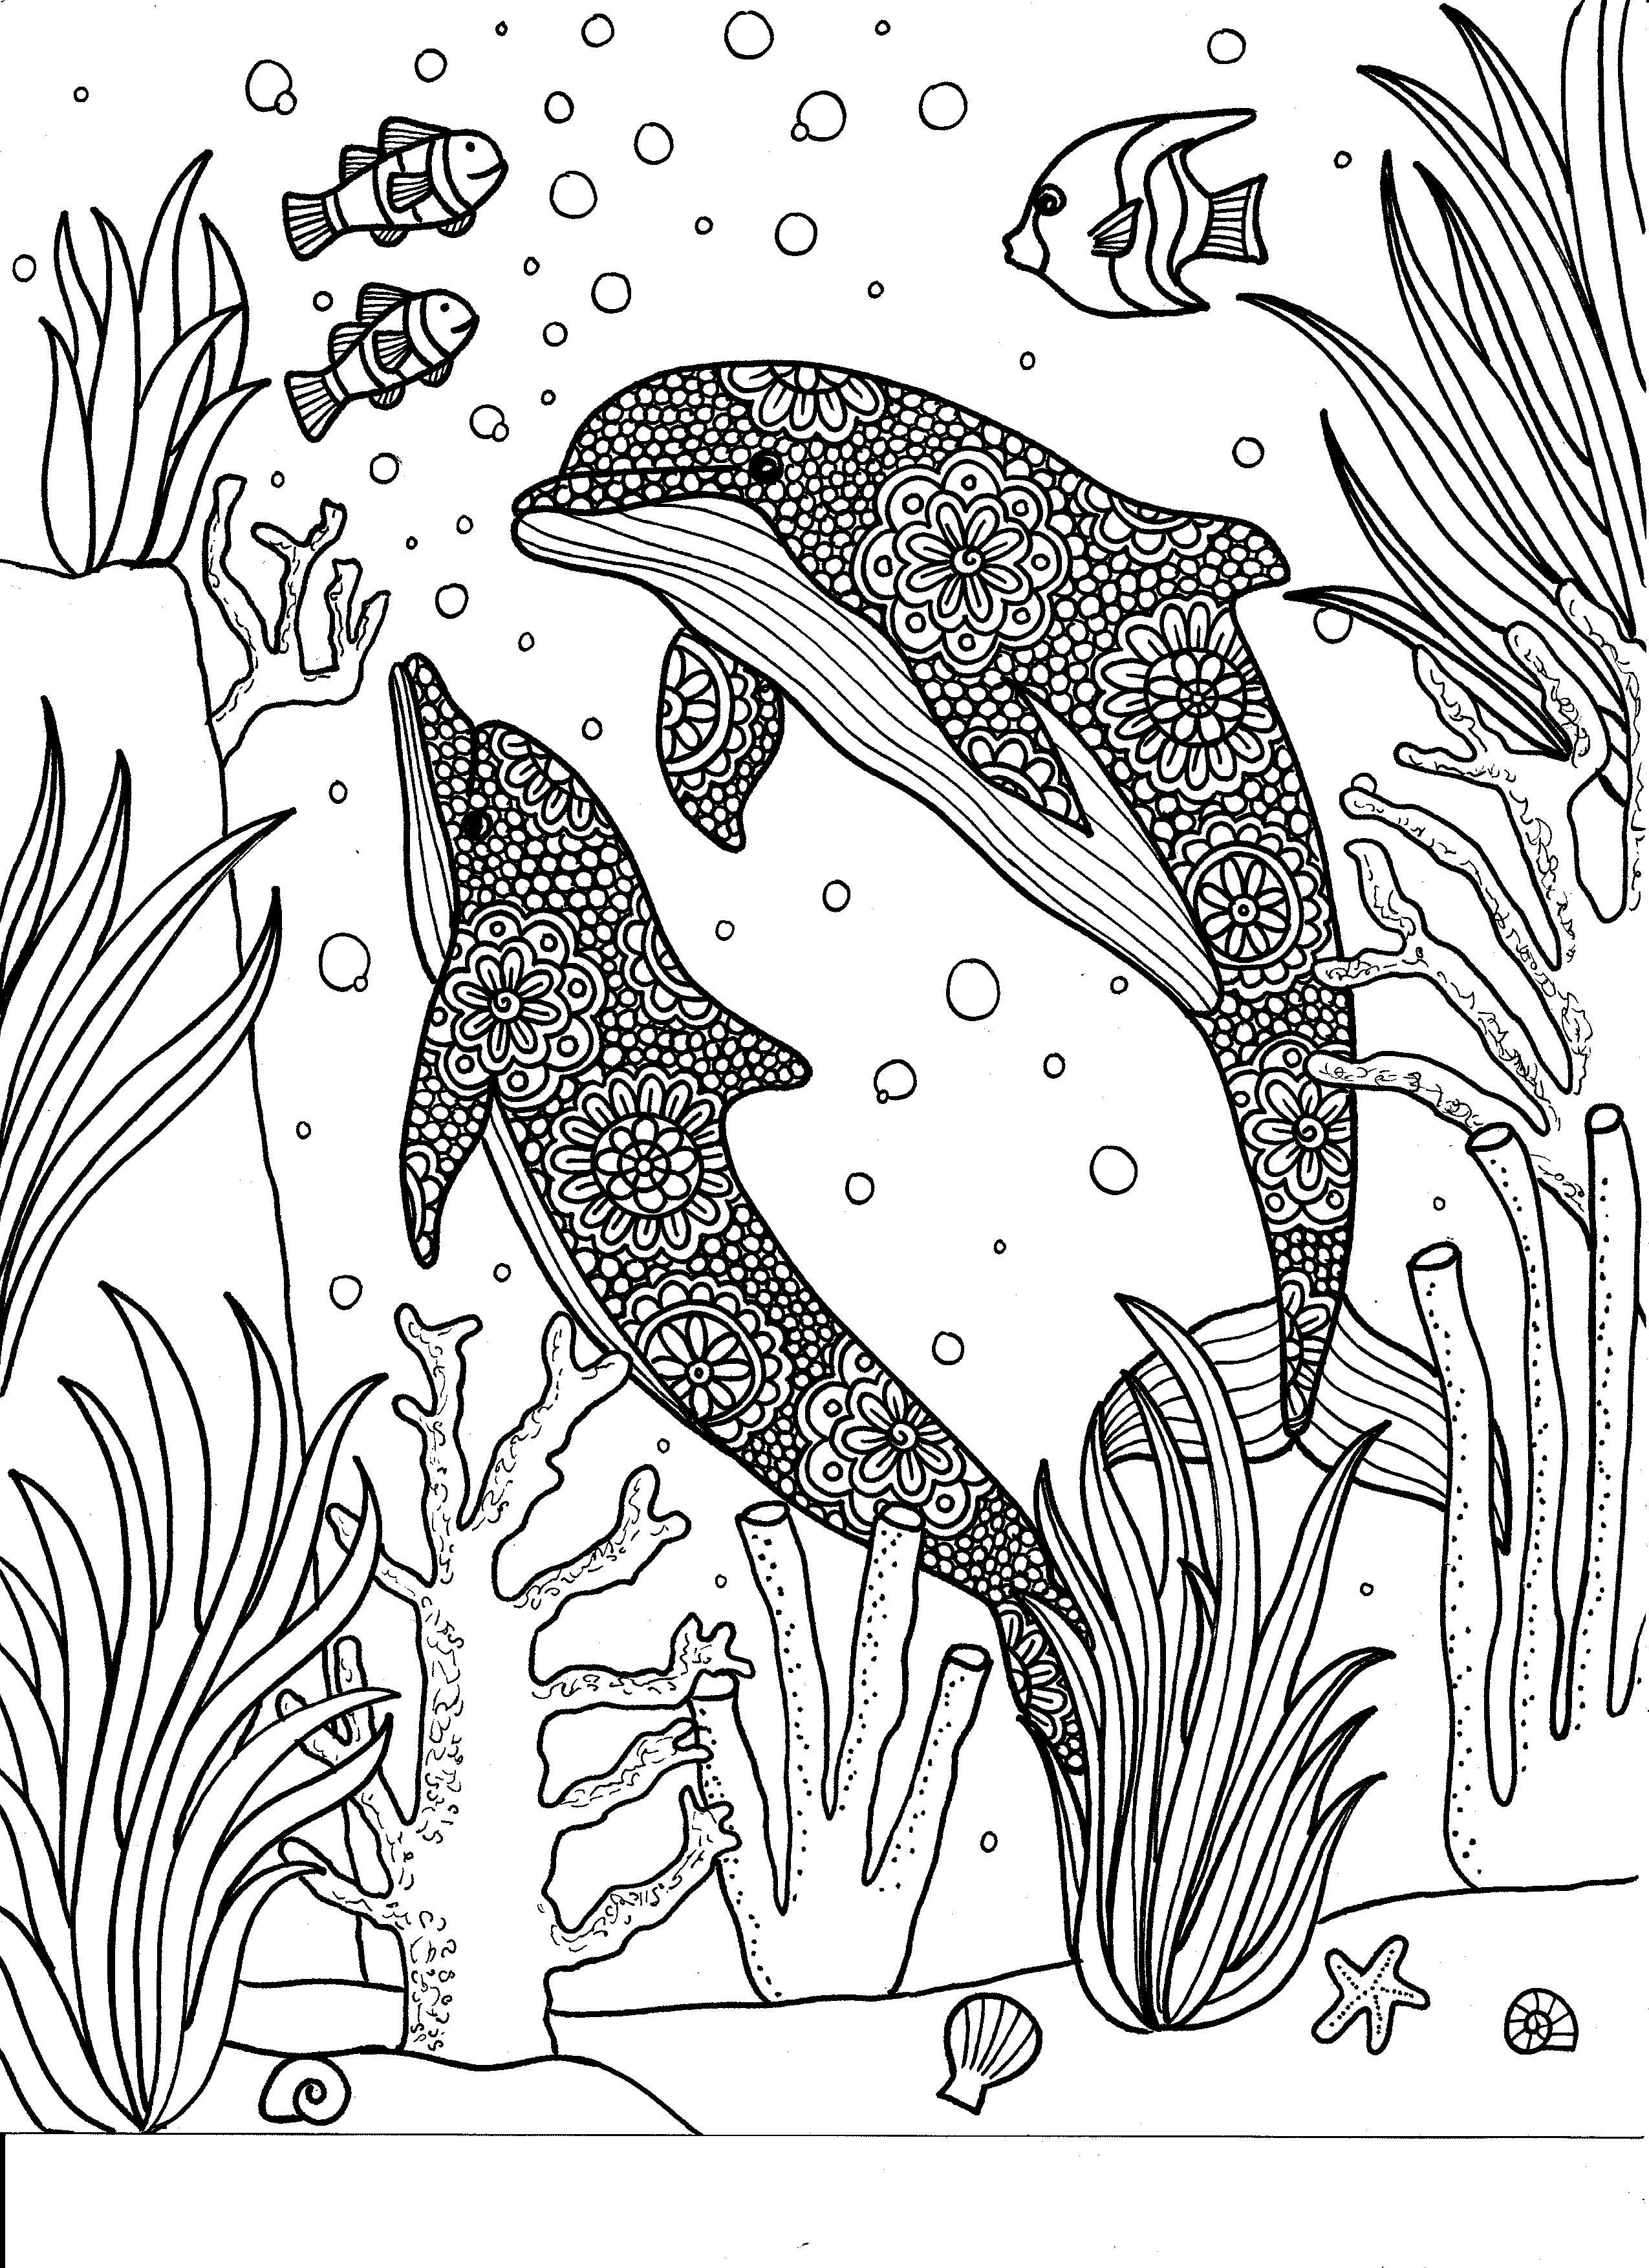 Inkspirations Animal Kingdom Dolphin Coloring Pages Animal Coloring Pages Coloring Pages